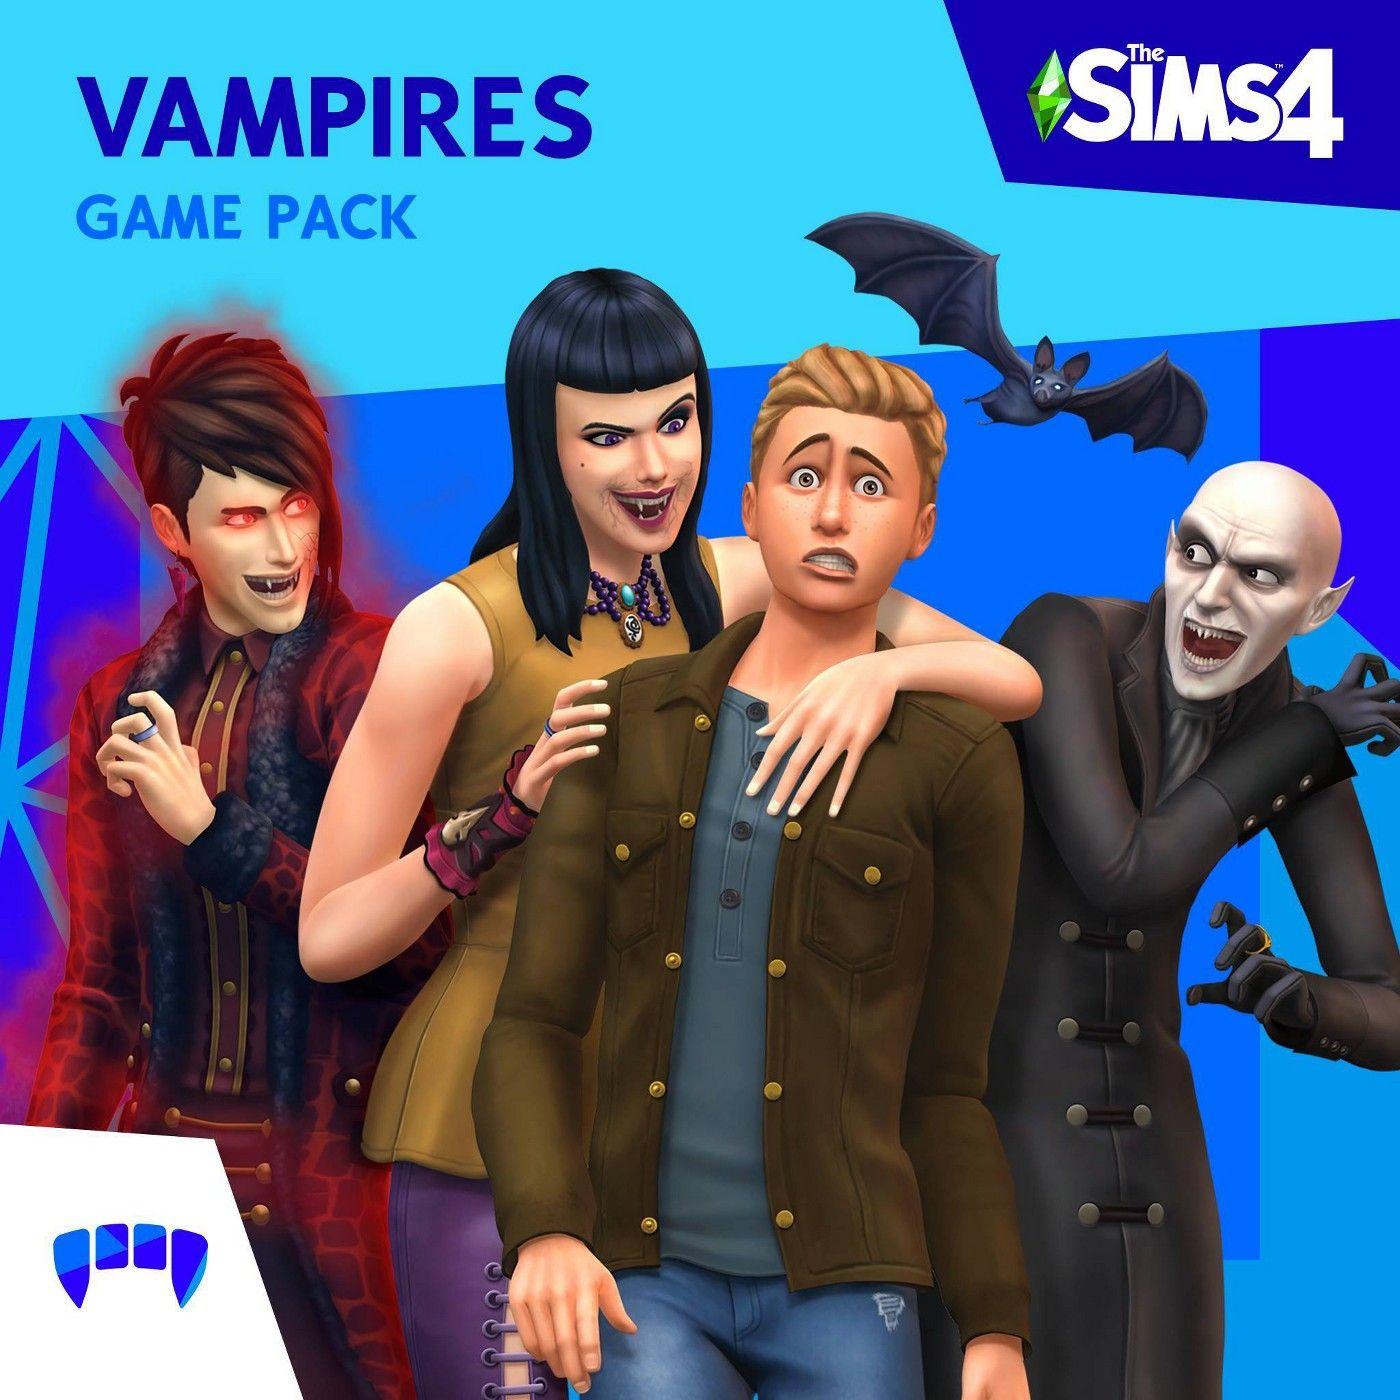 The Sims 4: Vampires Game Pack - PlayStation 4 (Digital